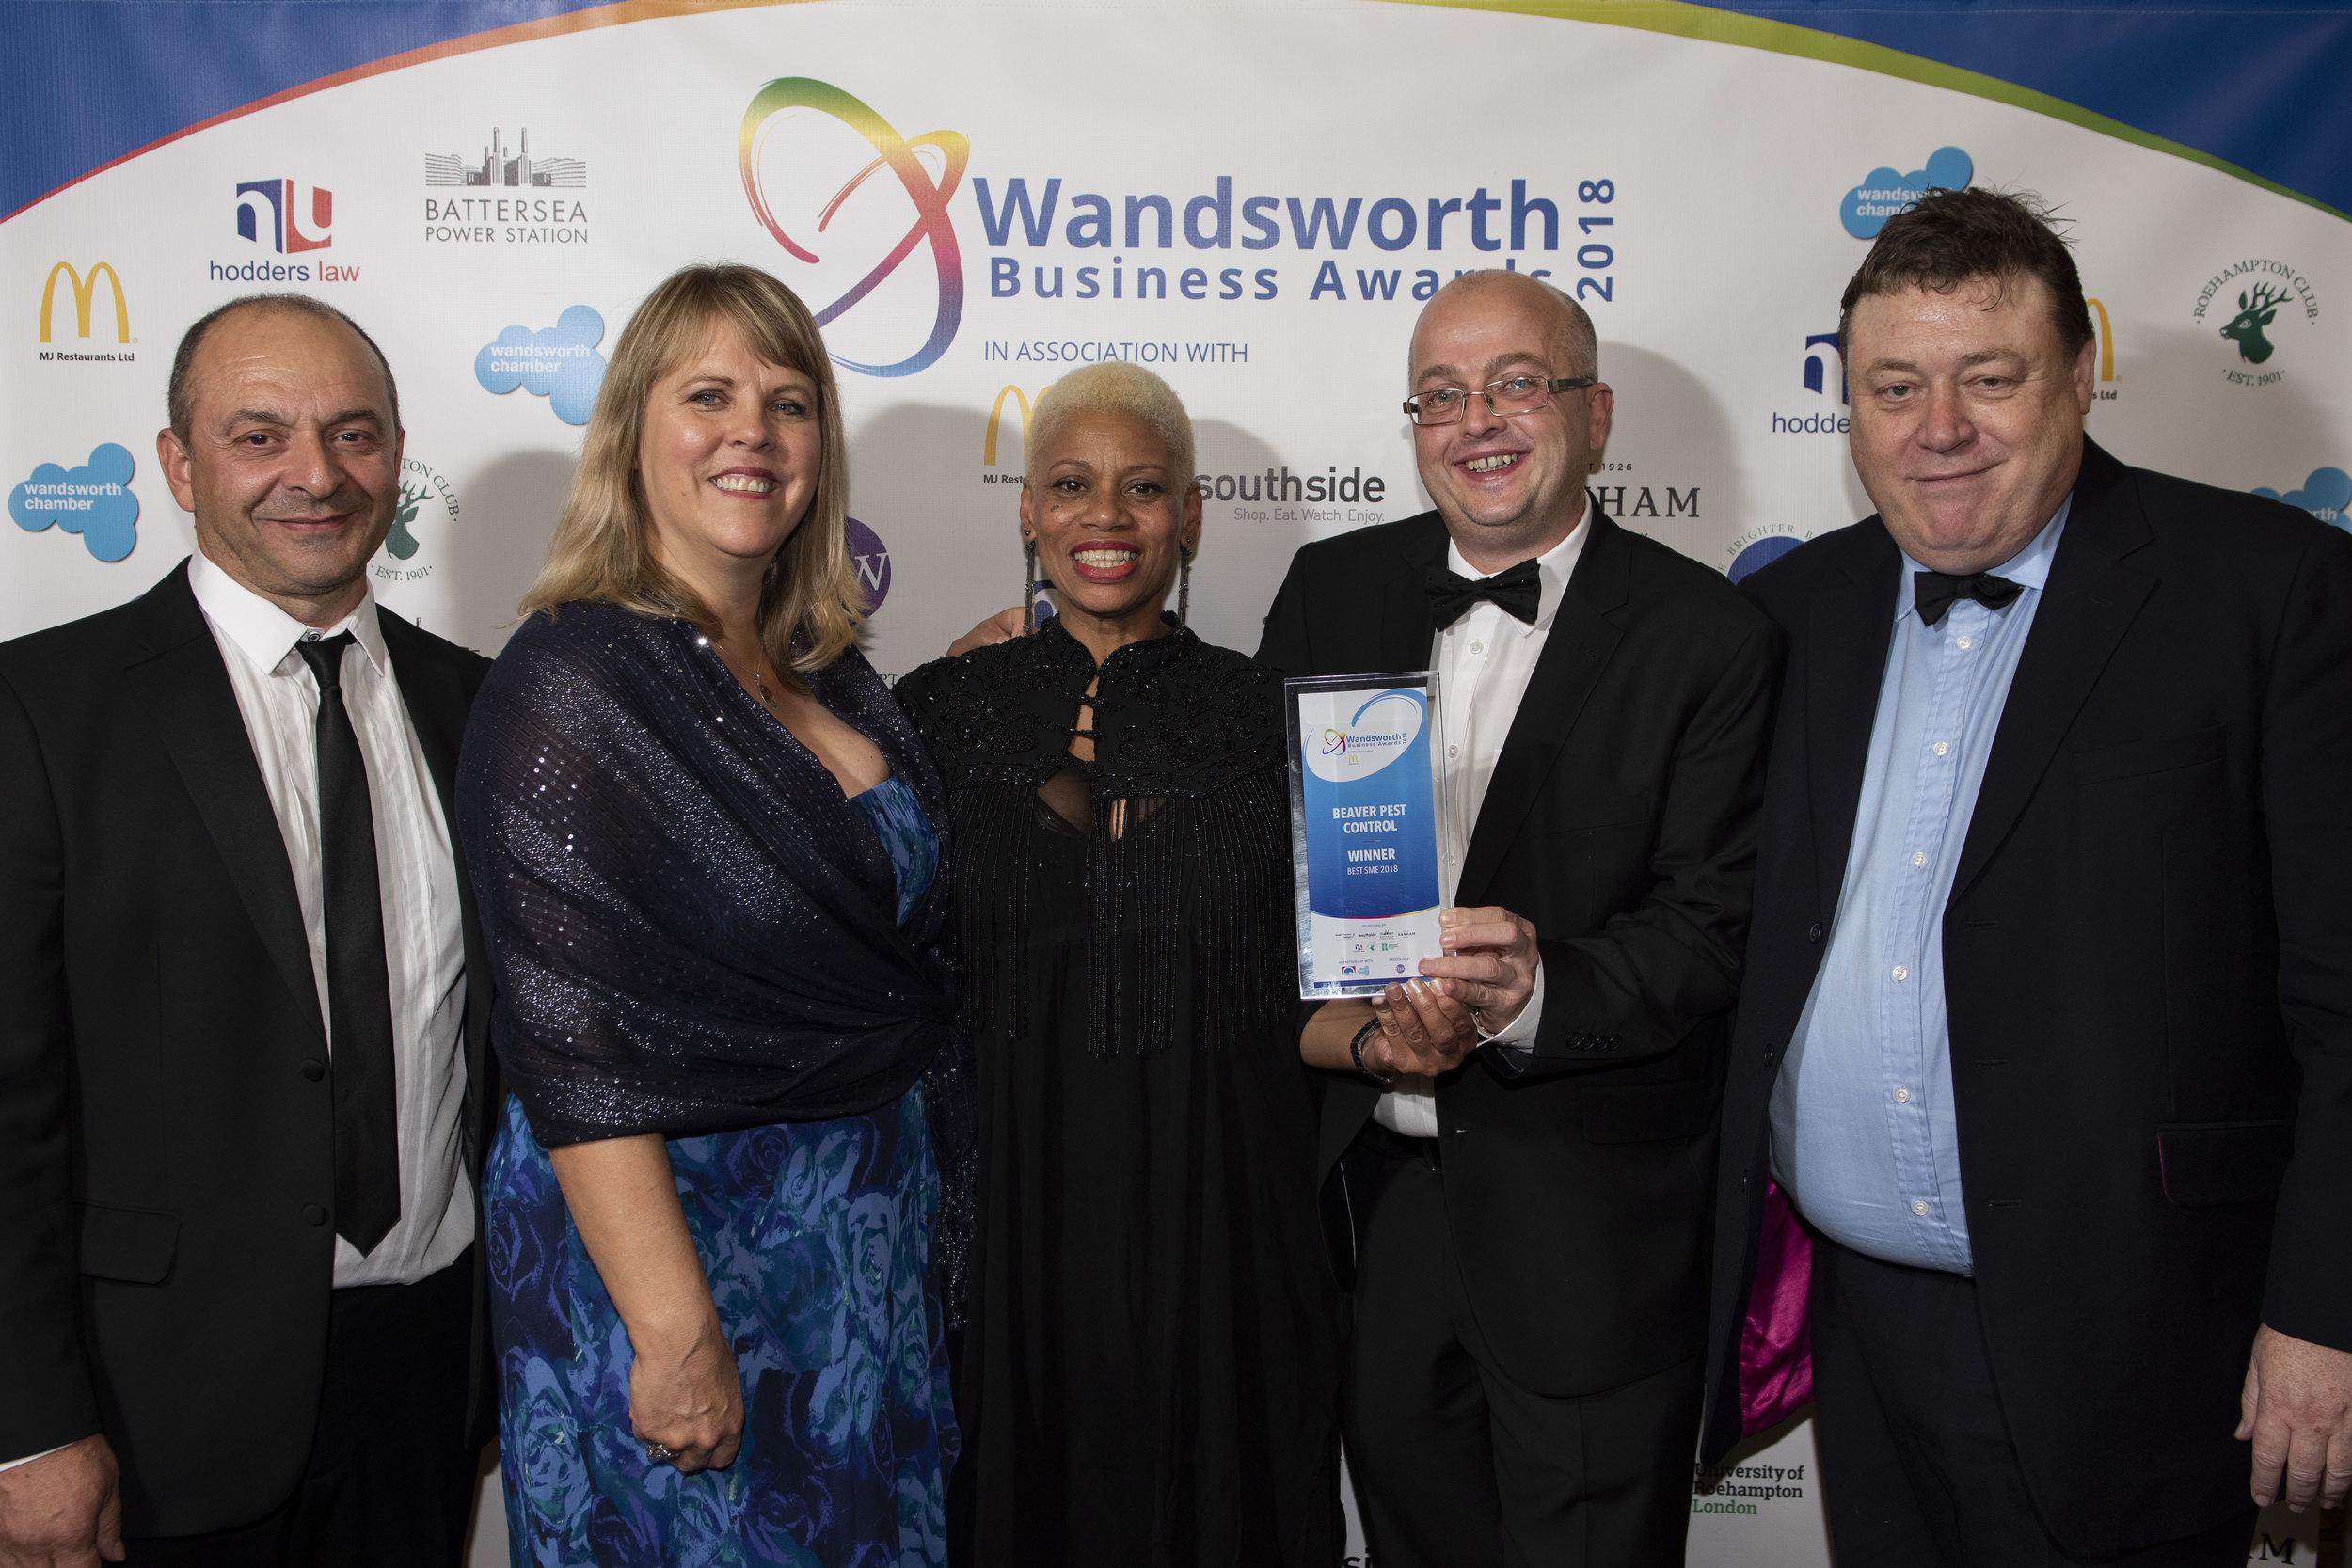 WANDSWORTH-WINNERS-2018_004 SME.jpg